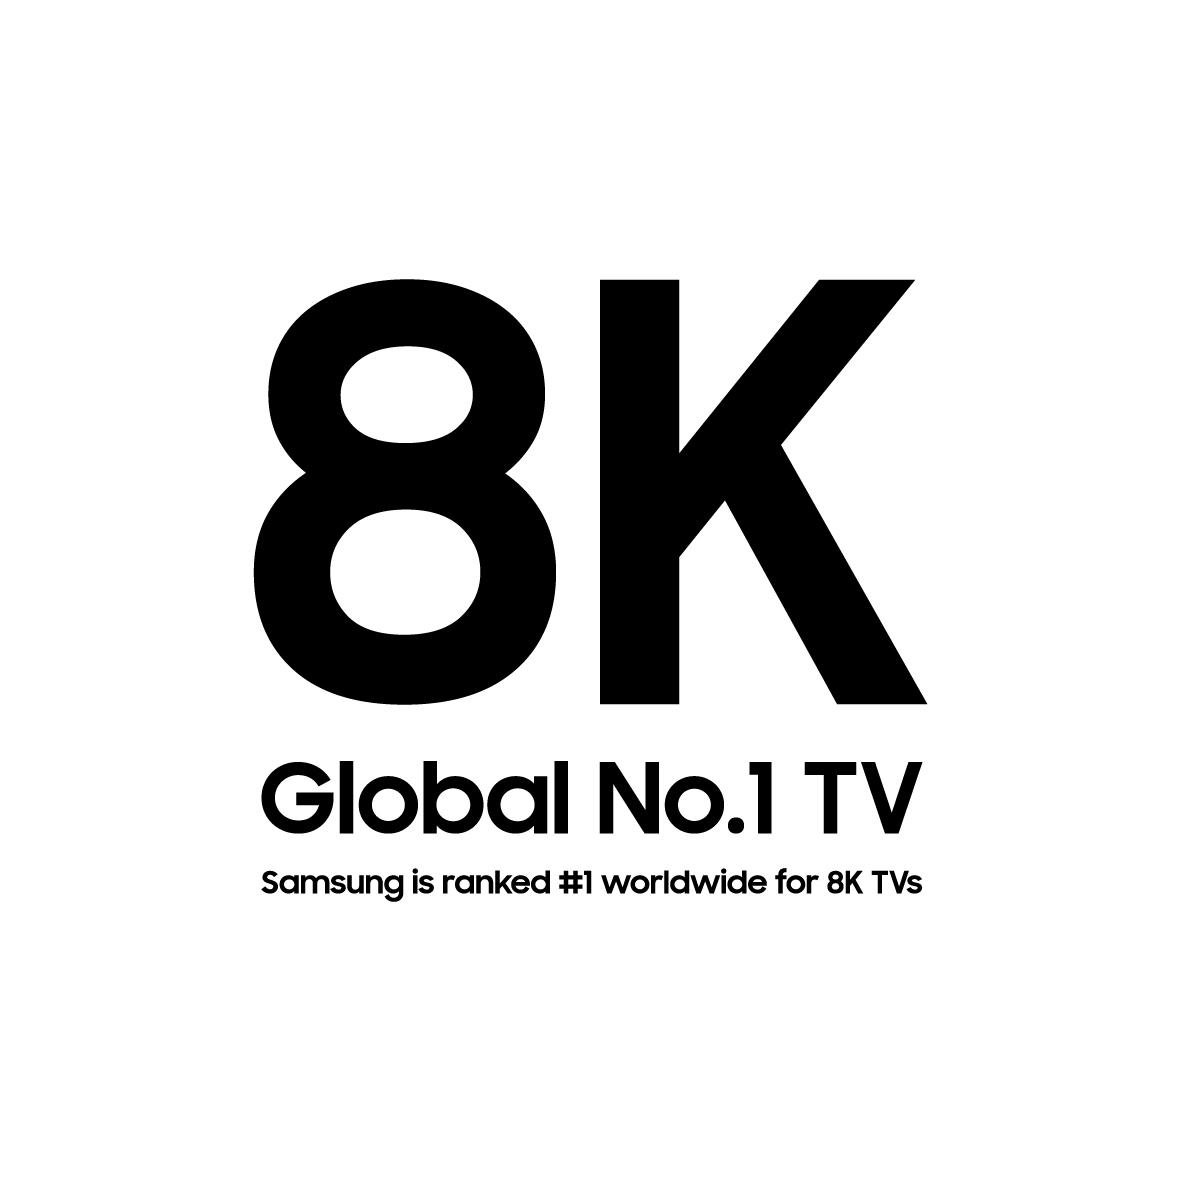 8K Global No. 1 TV